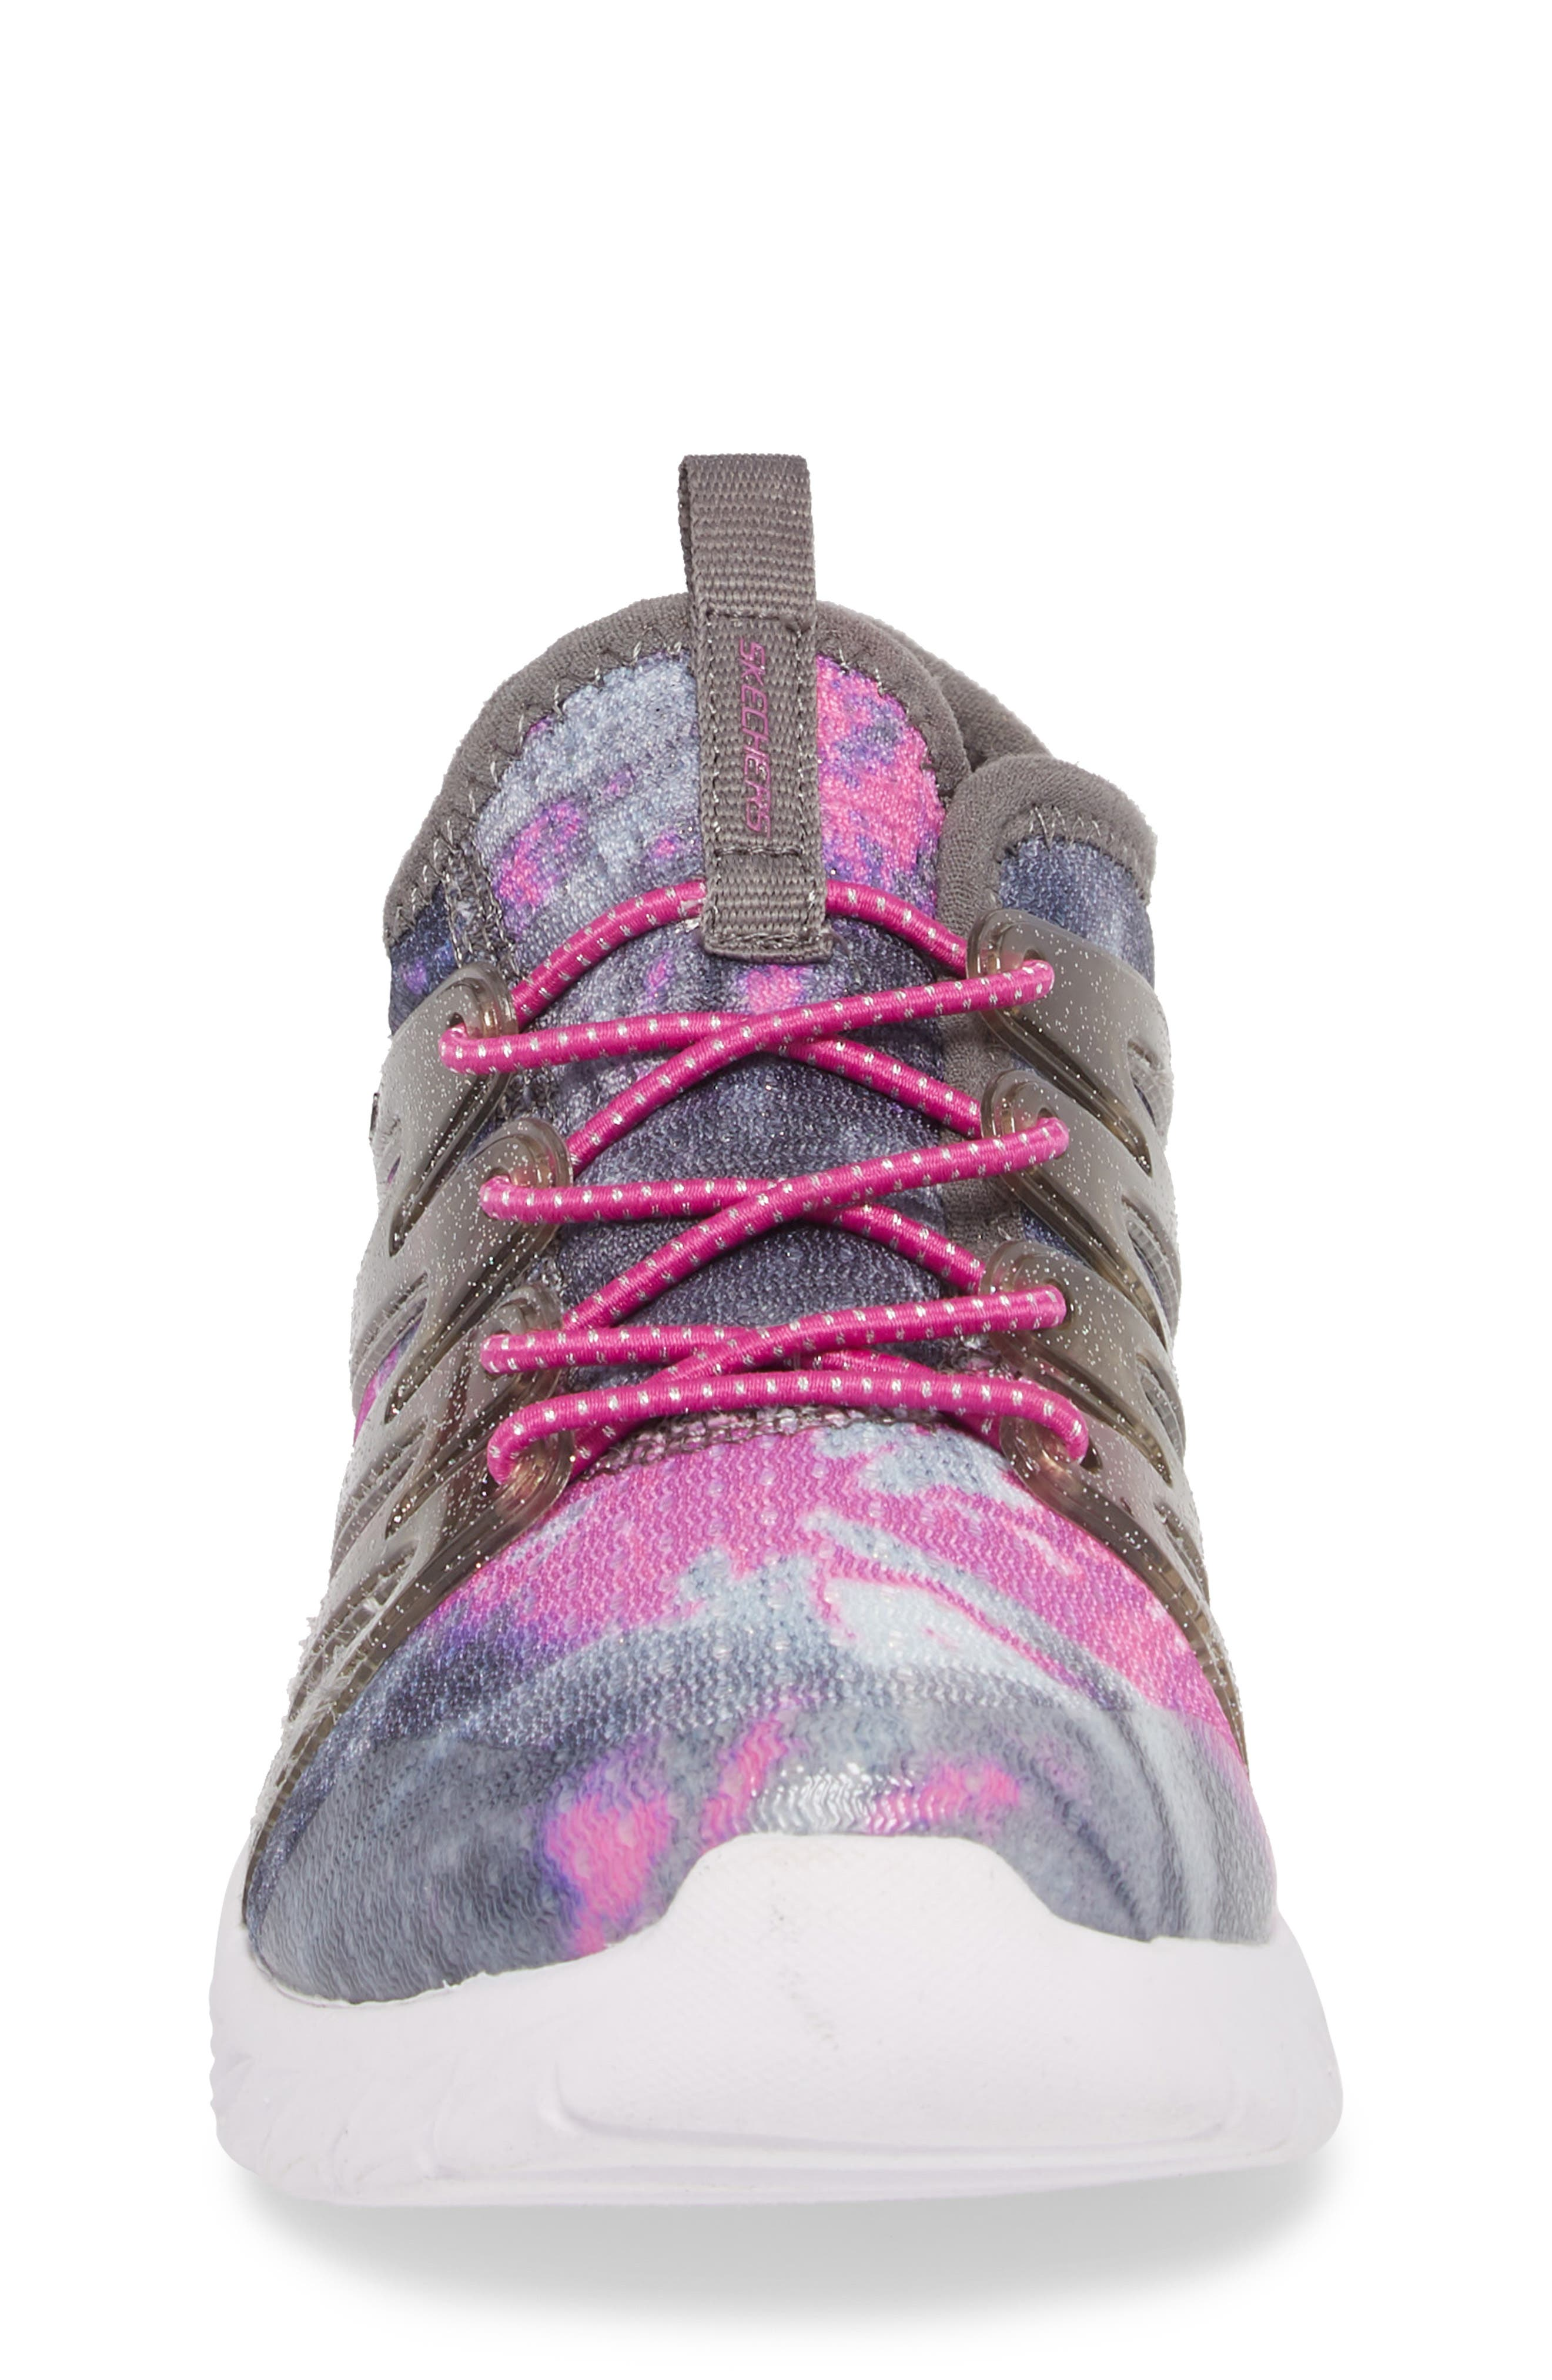 Skech Gem Glitter Sneaker,                             Alternate thumbnail 6, color,                             Charcoal/ Hot Pink